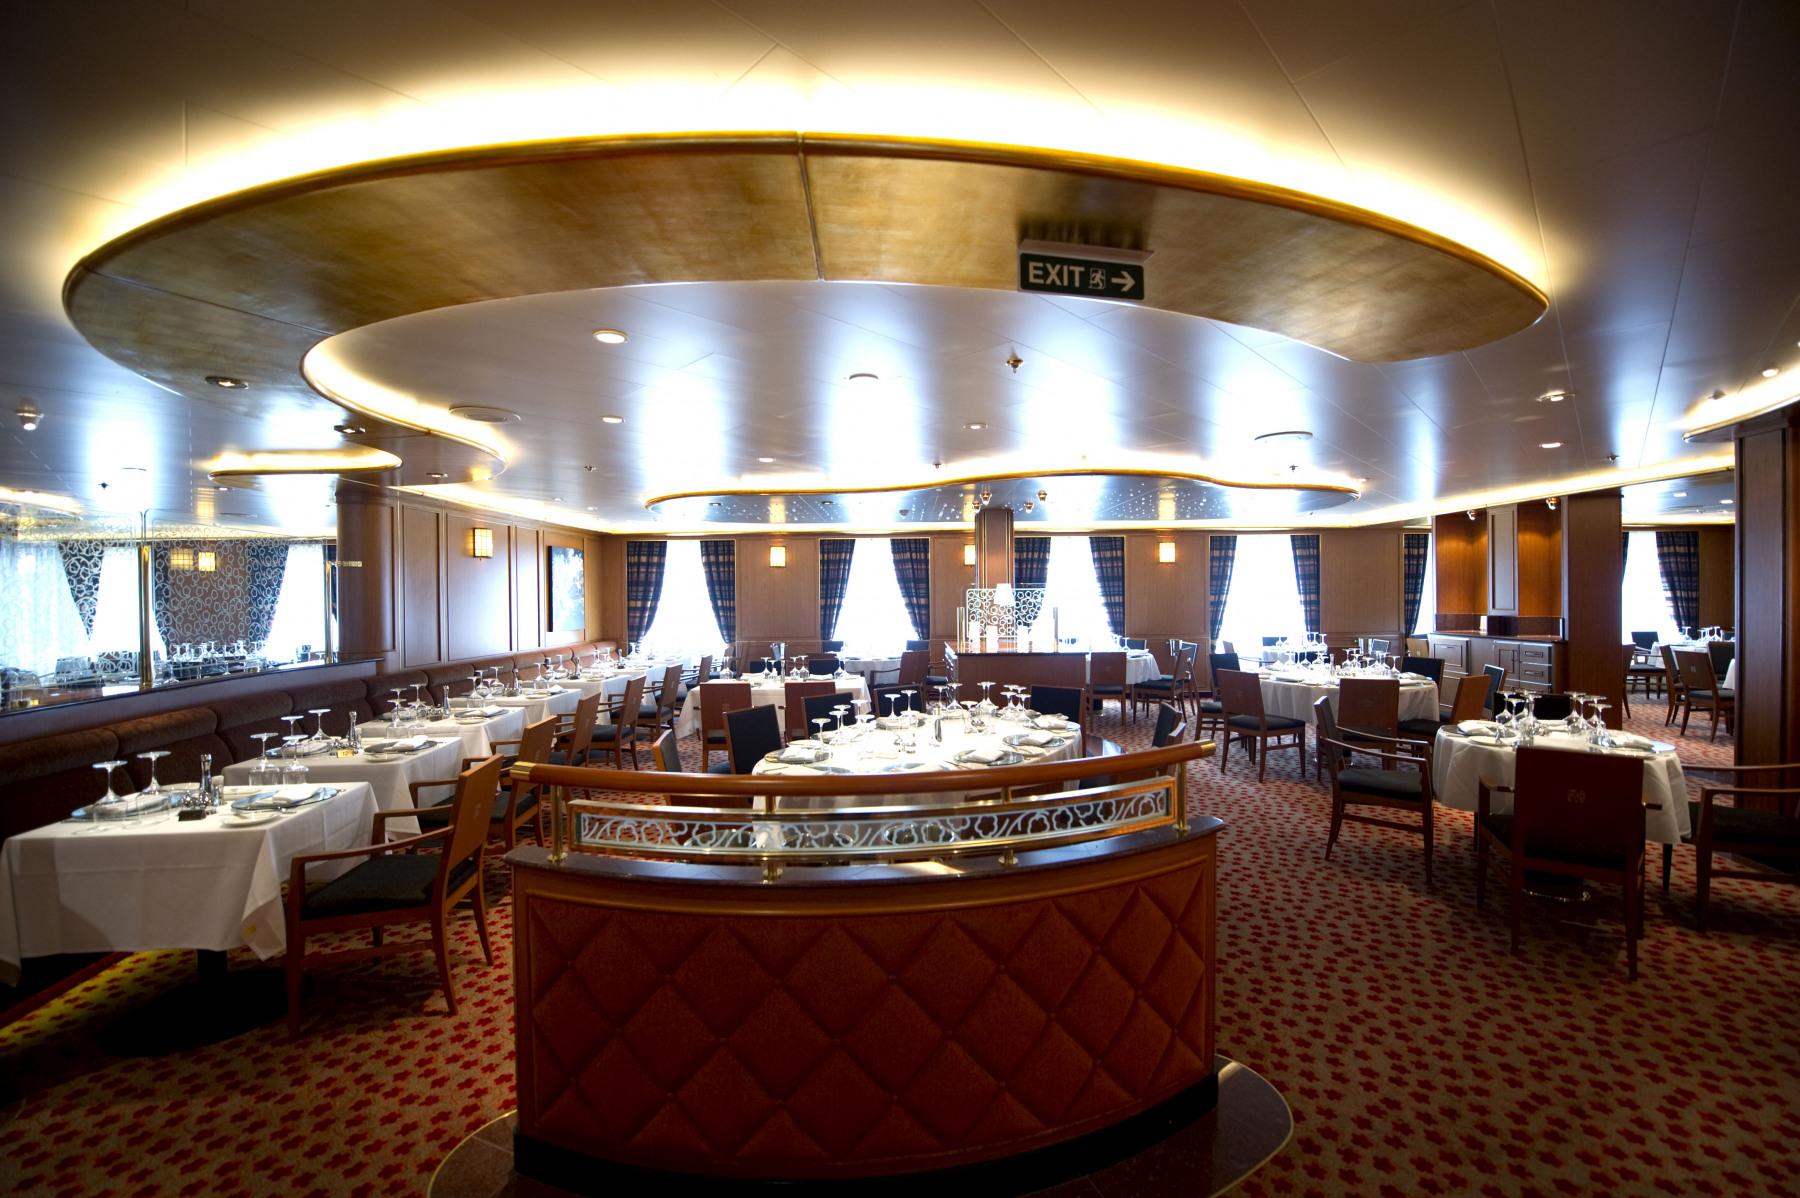 P&O Cruises Azura Interior Meridian.jpg